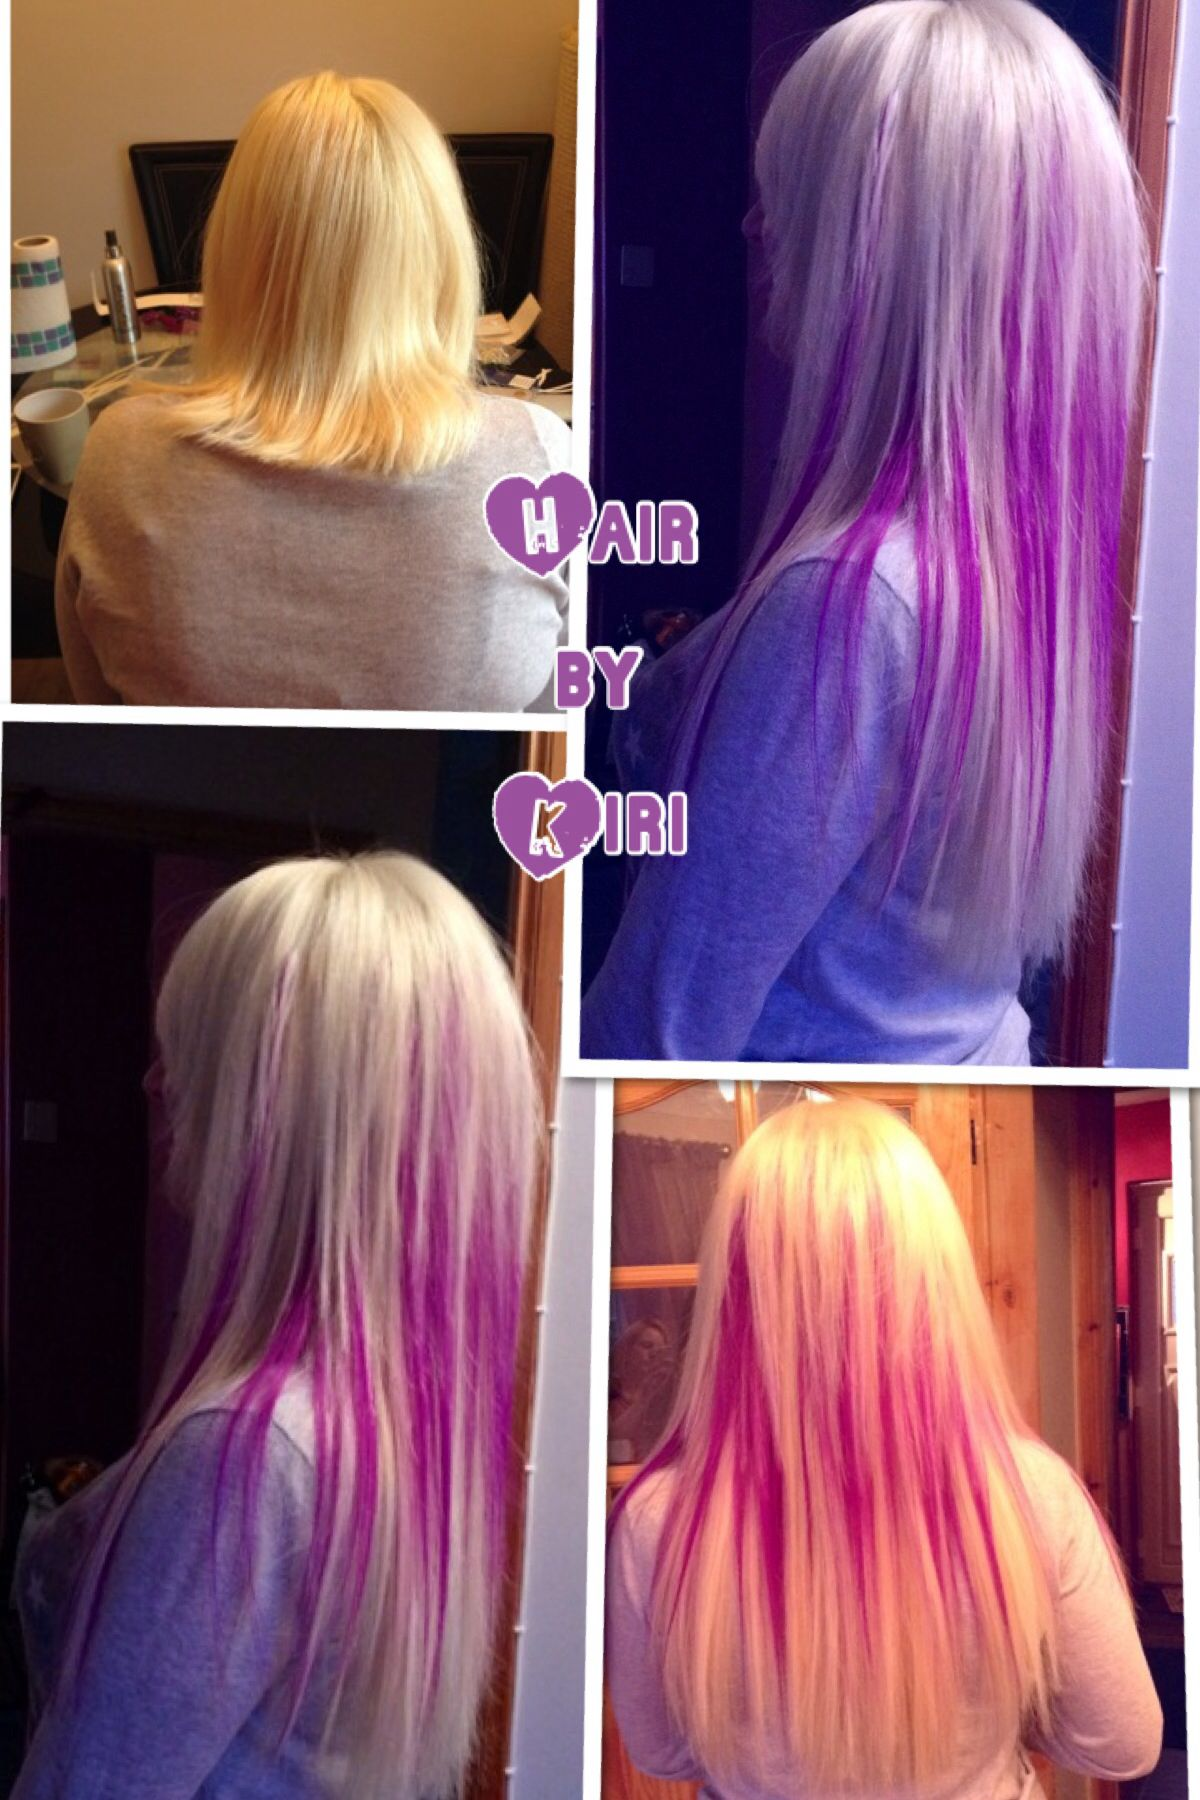 Keratin bonds hair extensions blondepurple hair pinterest keratin bonds hair extensions blondepurple pmusecretfo Choice Image